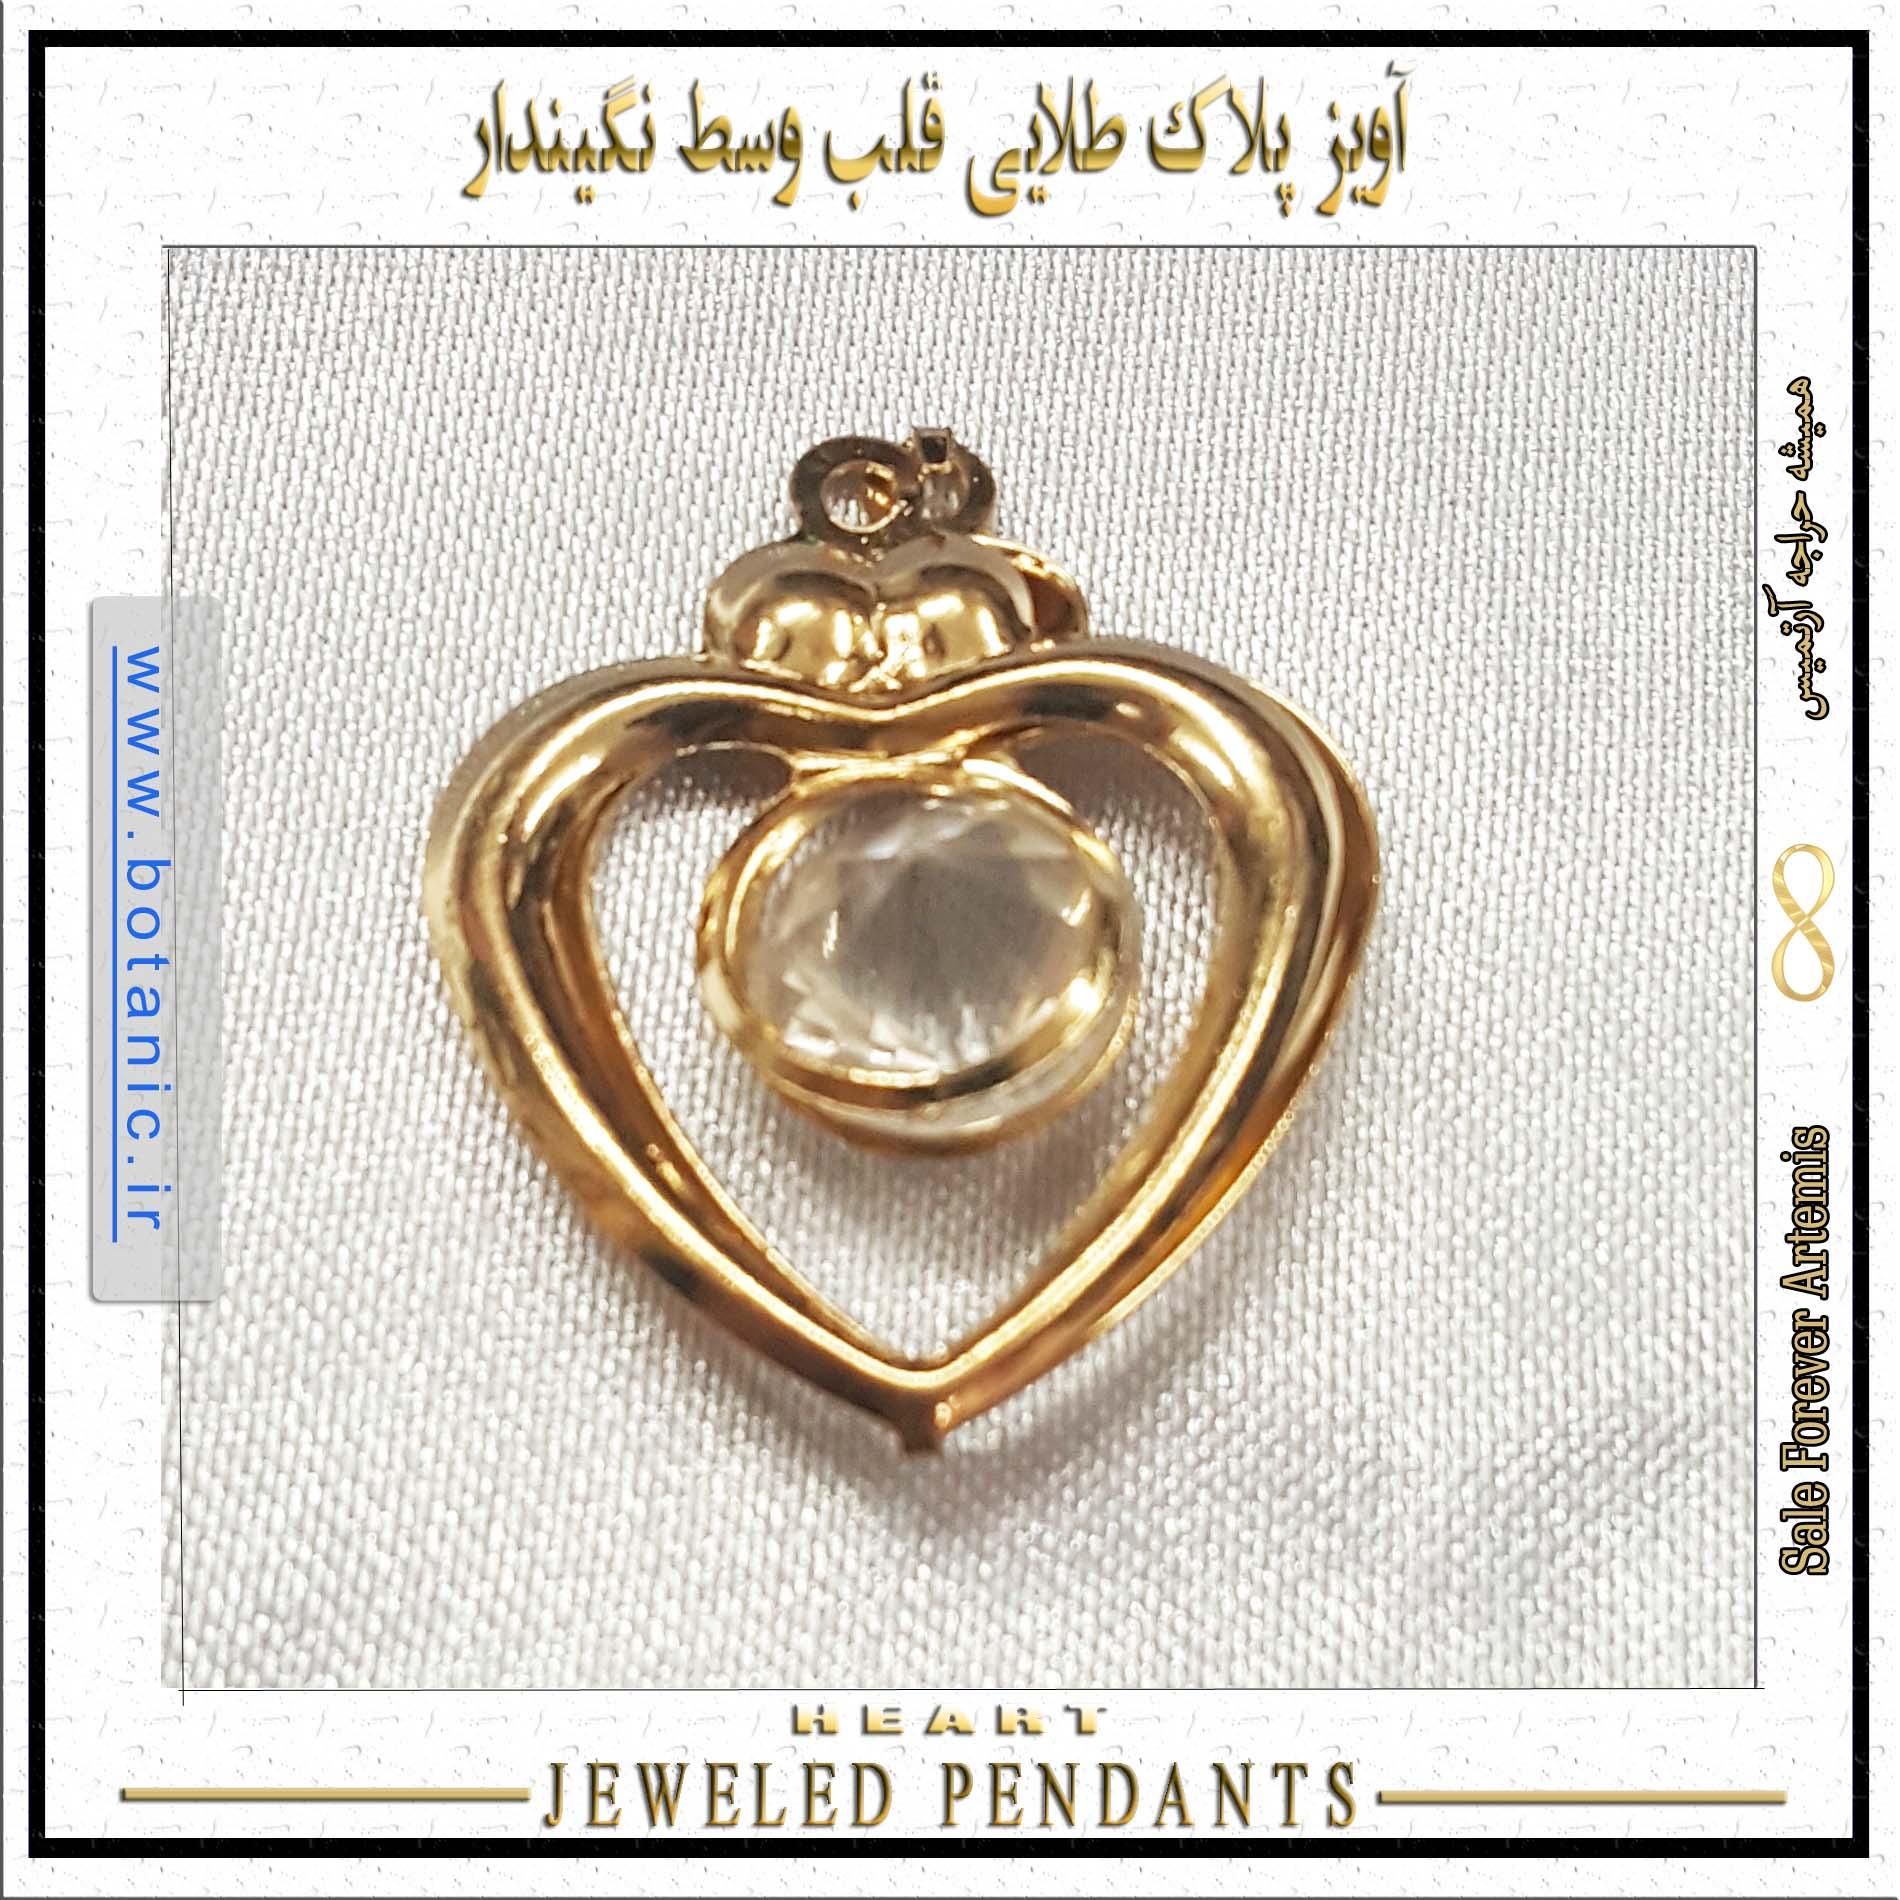 Jeweled Pendants